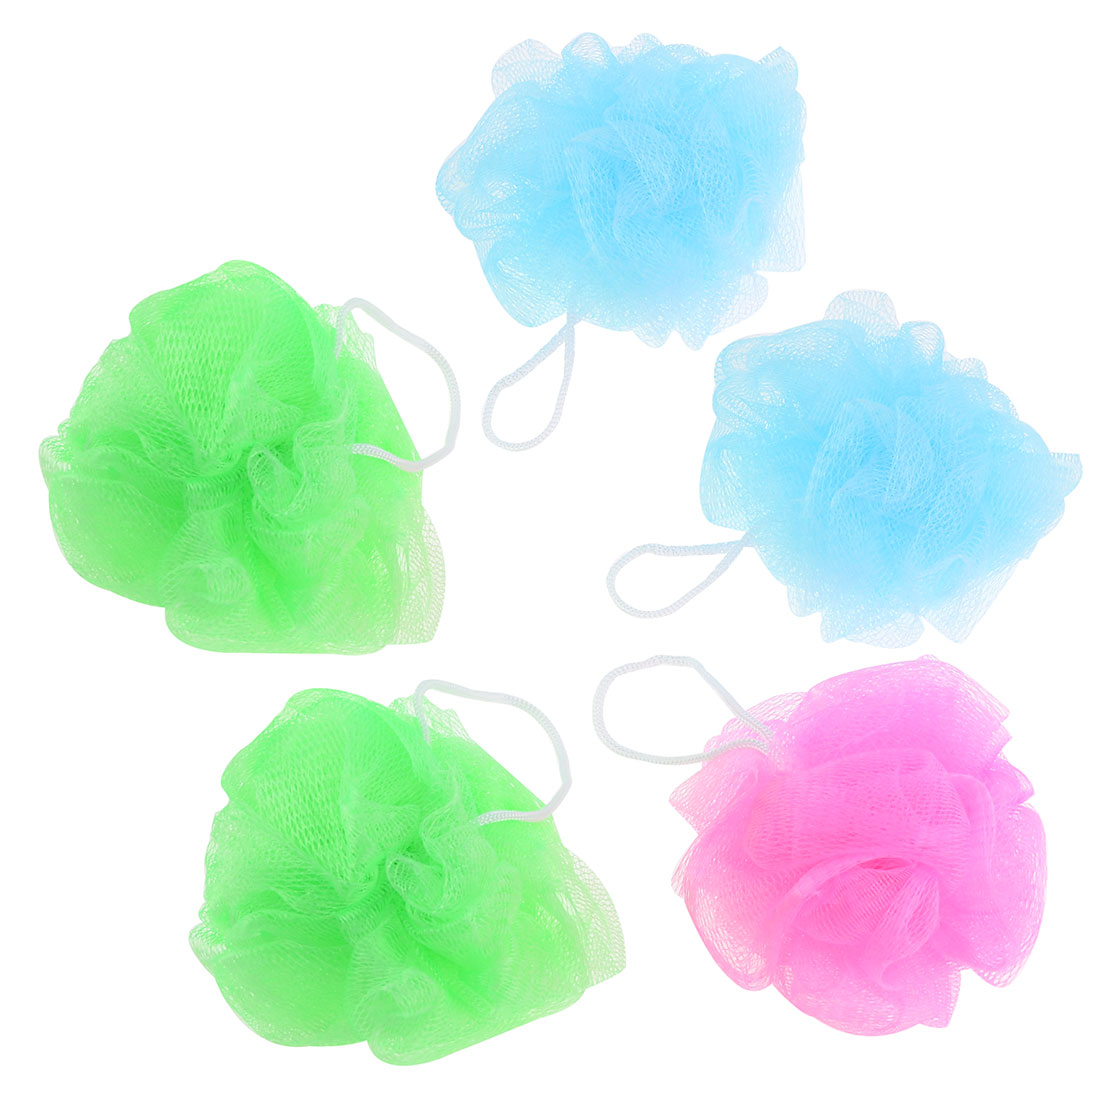 5 Pcs Bathroom Bubbles Puff Tri Color Meshy Nylon Bath Shower Pouf Body Scrubber